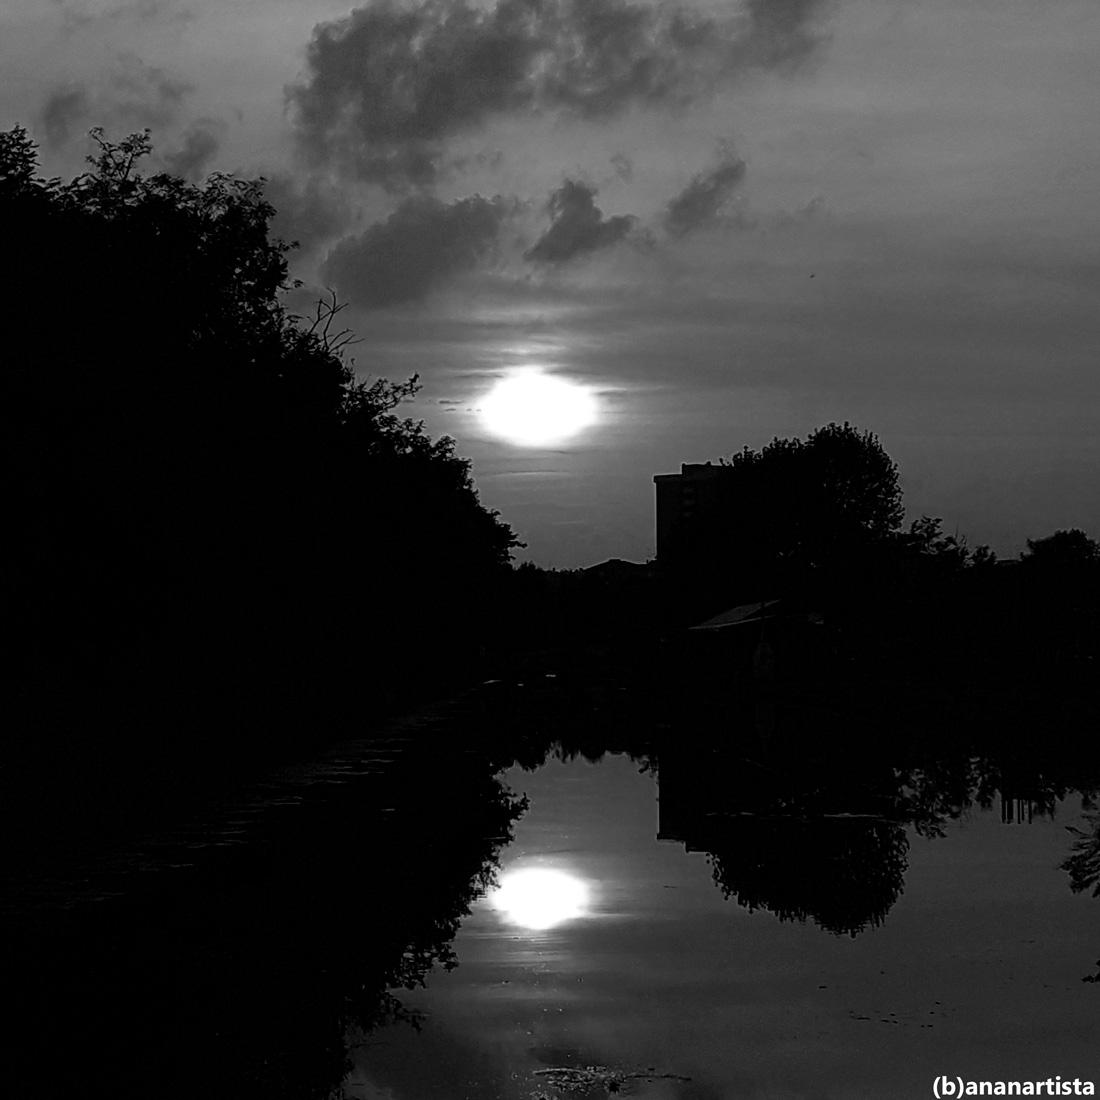 Der Untergang des Abendlandes fotografia di (b)ananartista sbuff